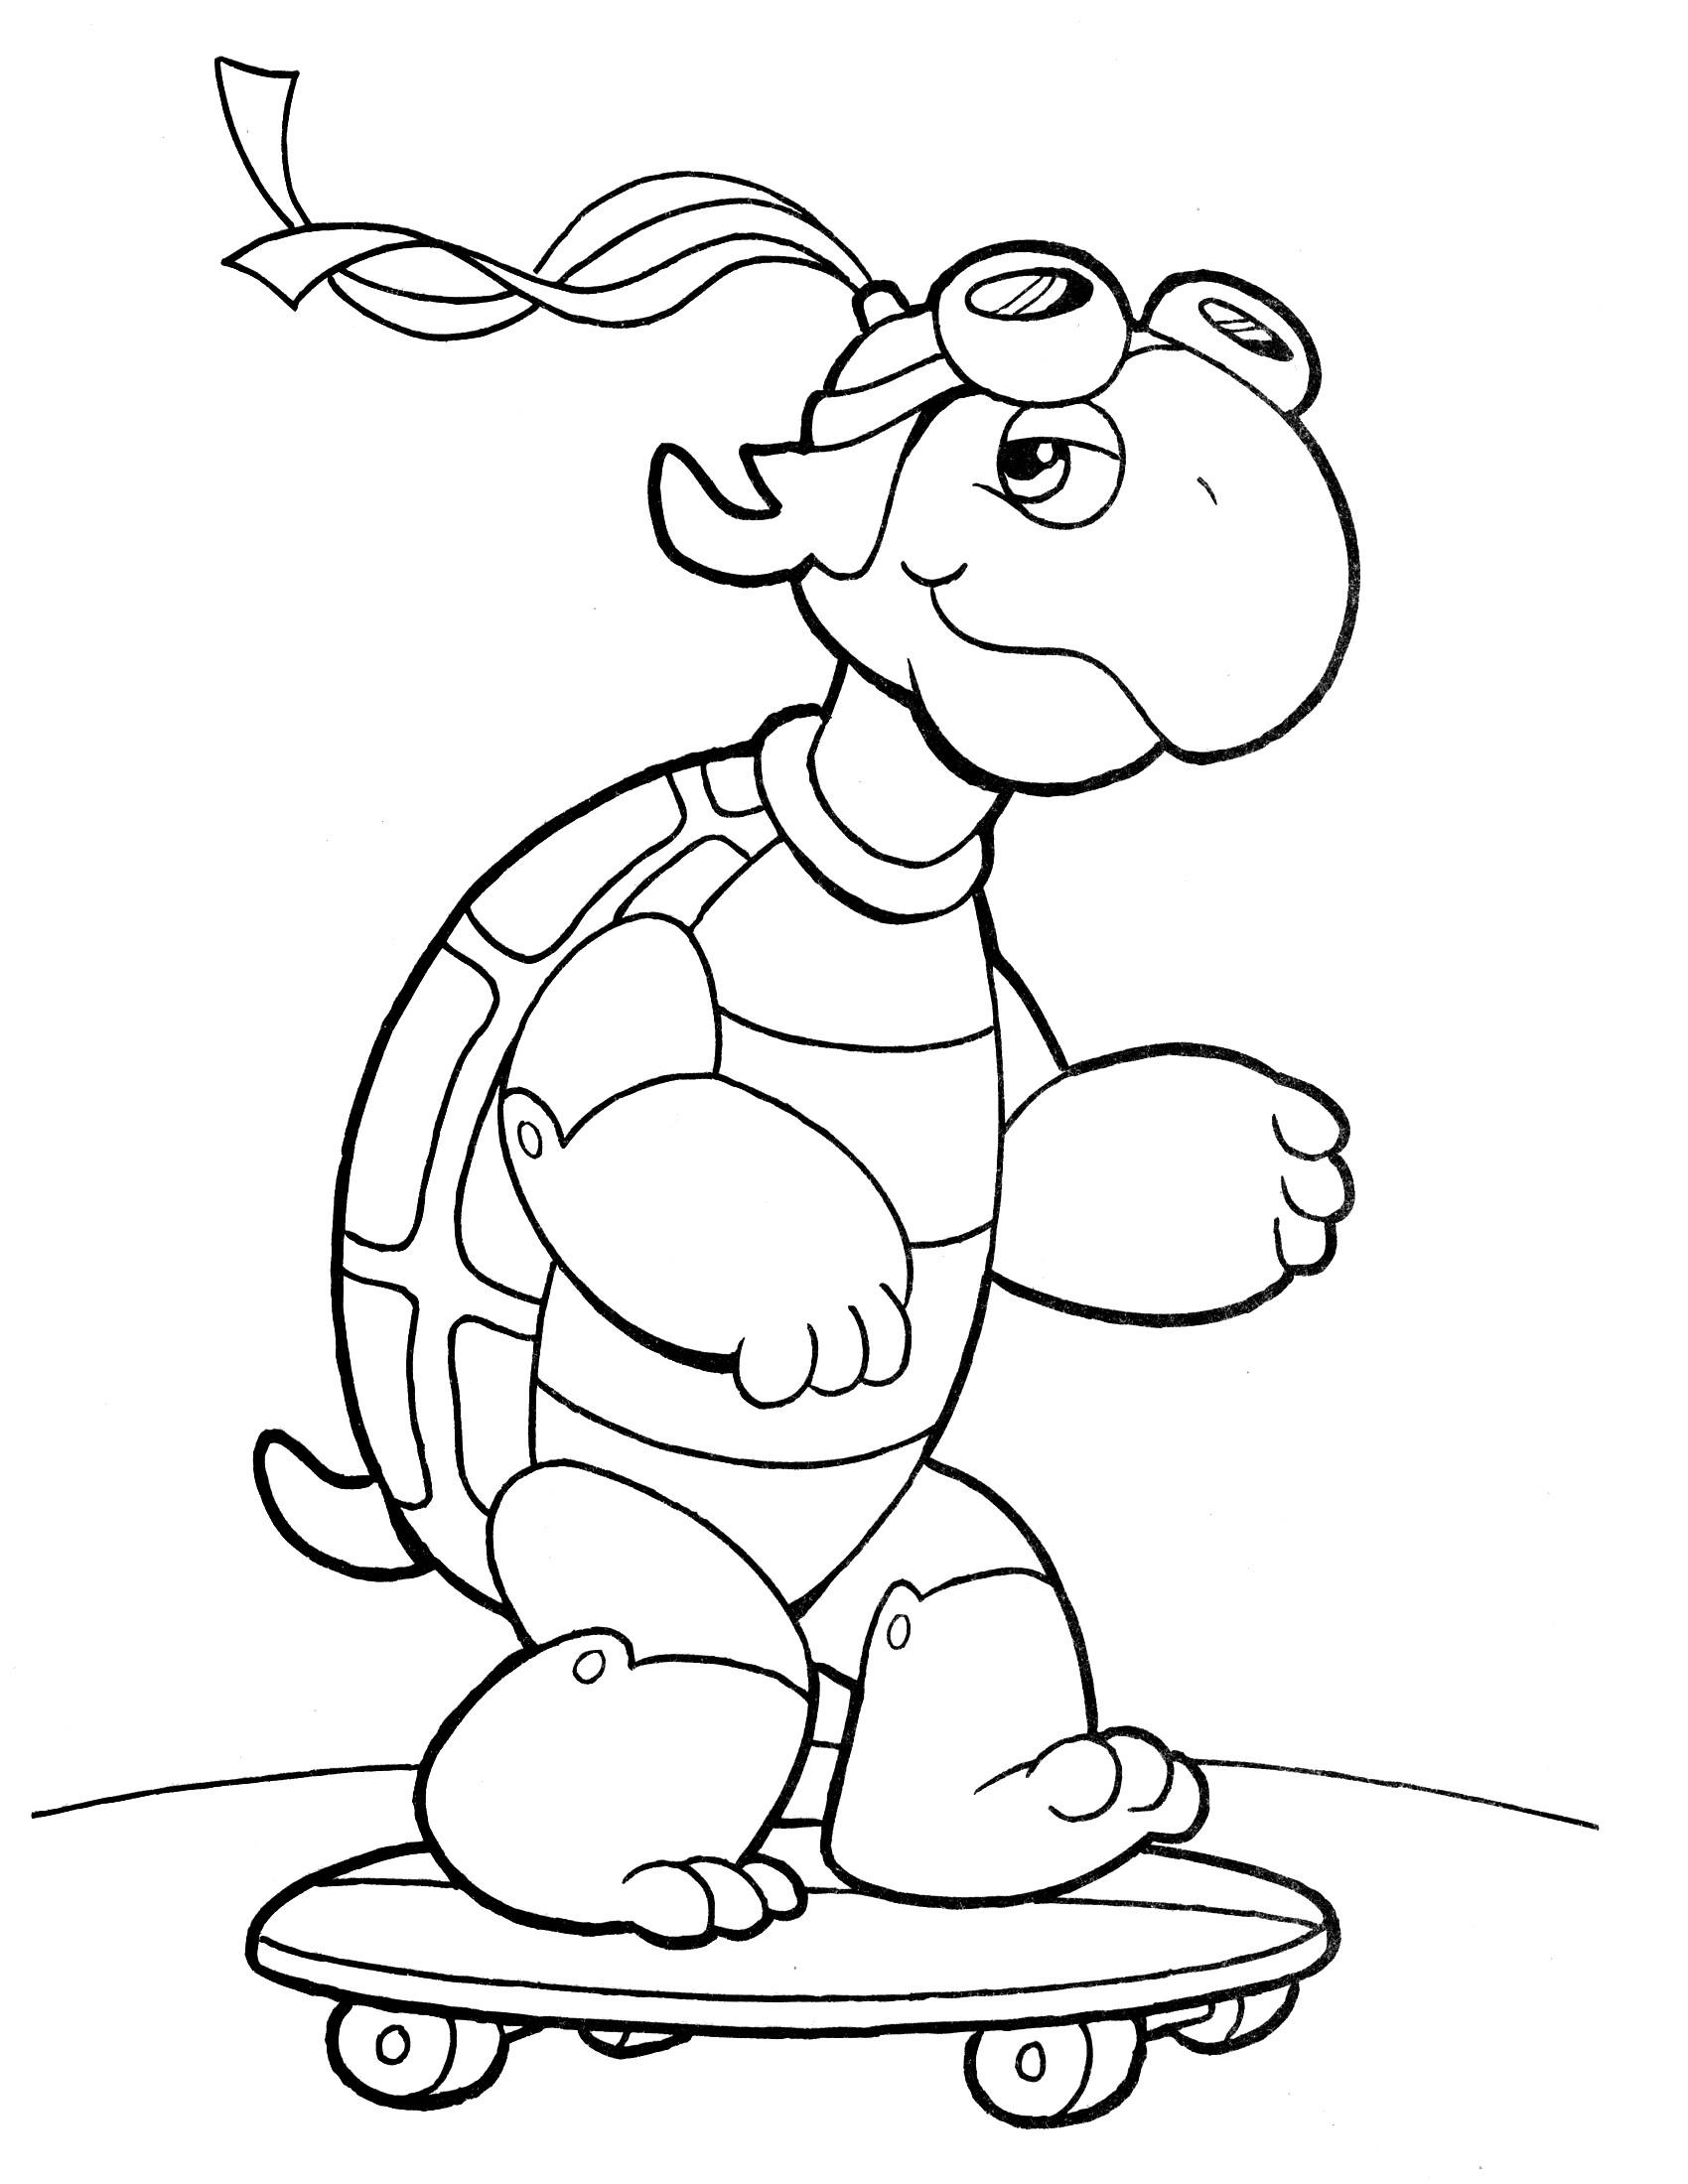 Crayola Markers Drawing at GetDrawings | Free download